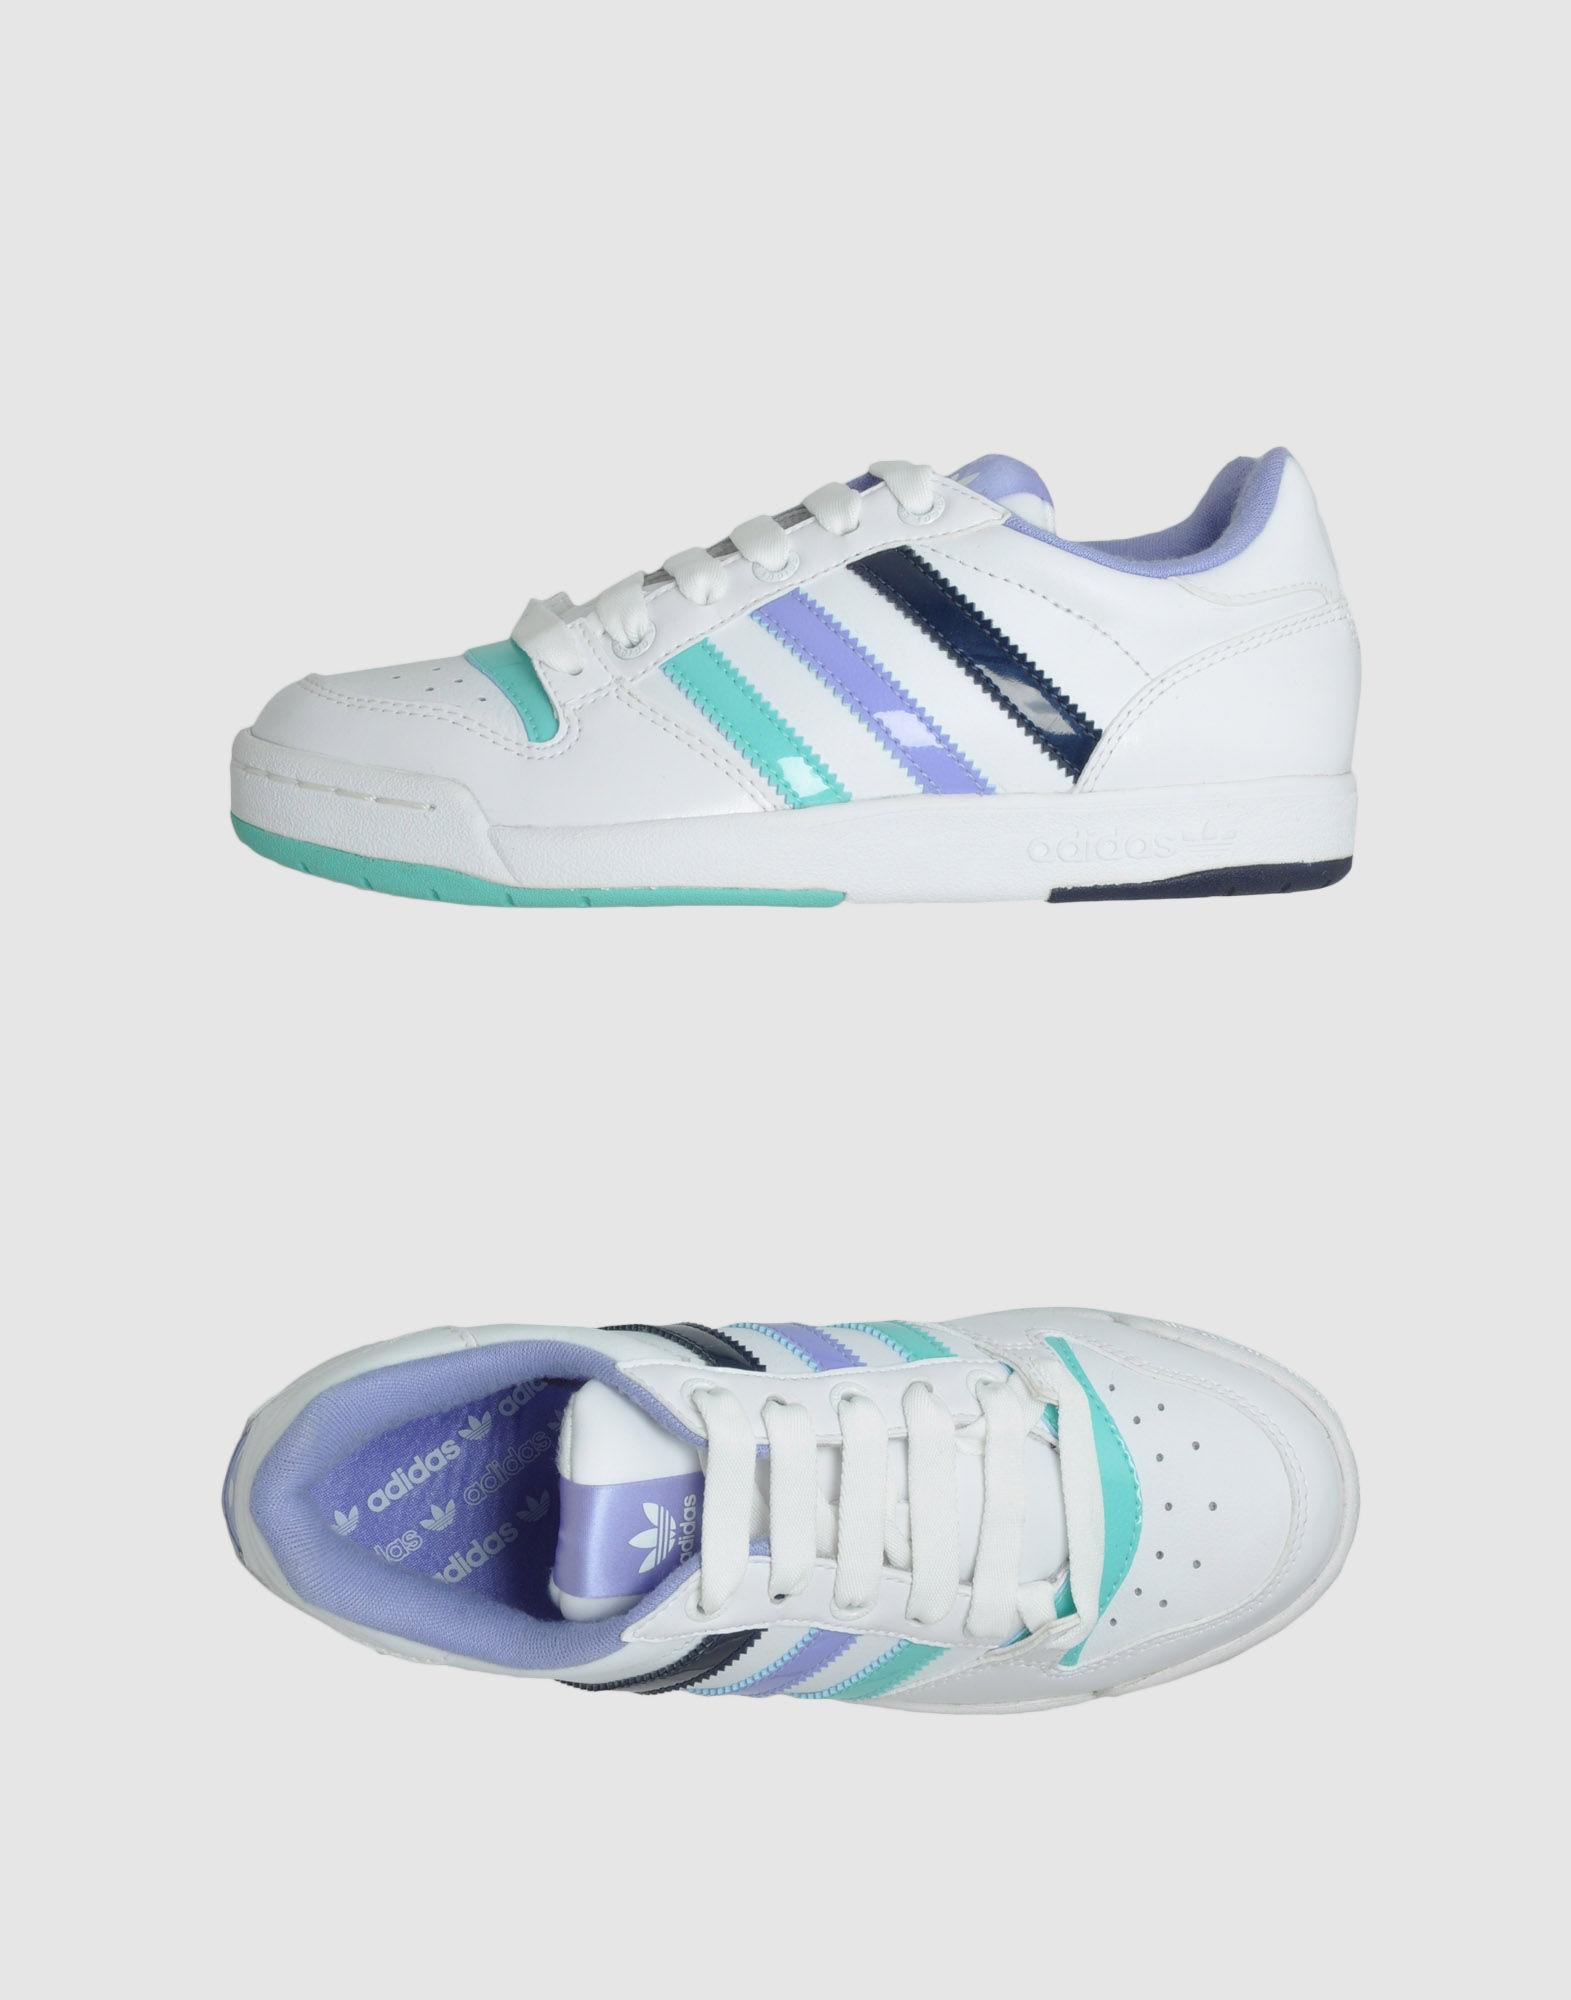 Adidas Sneakers - Women Adidas Australia  online on  Australia Adidas - 44336607CU af5ad5